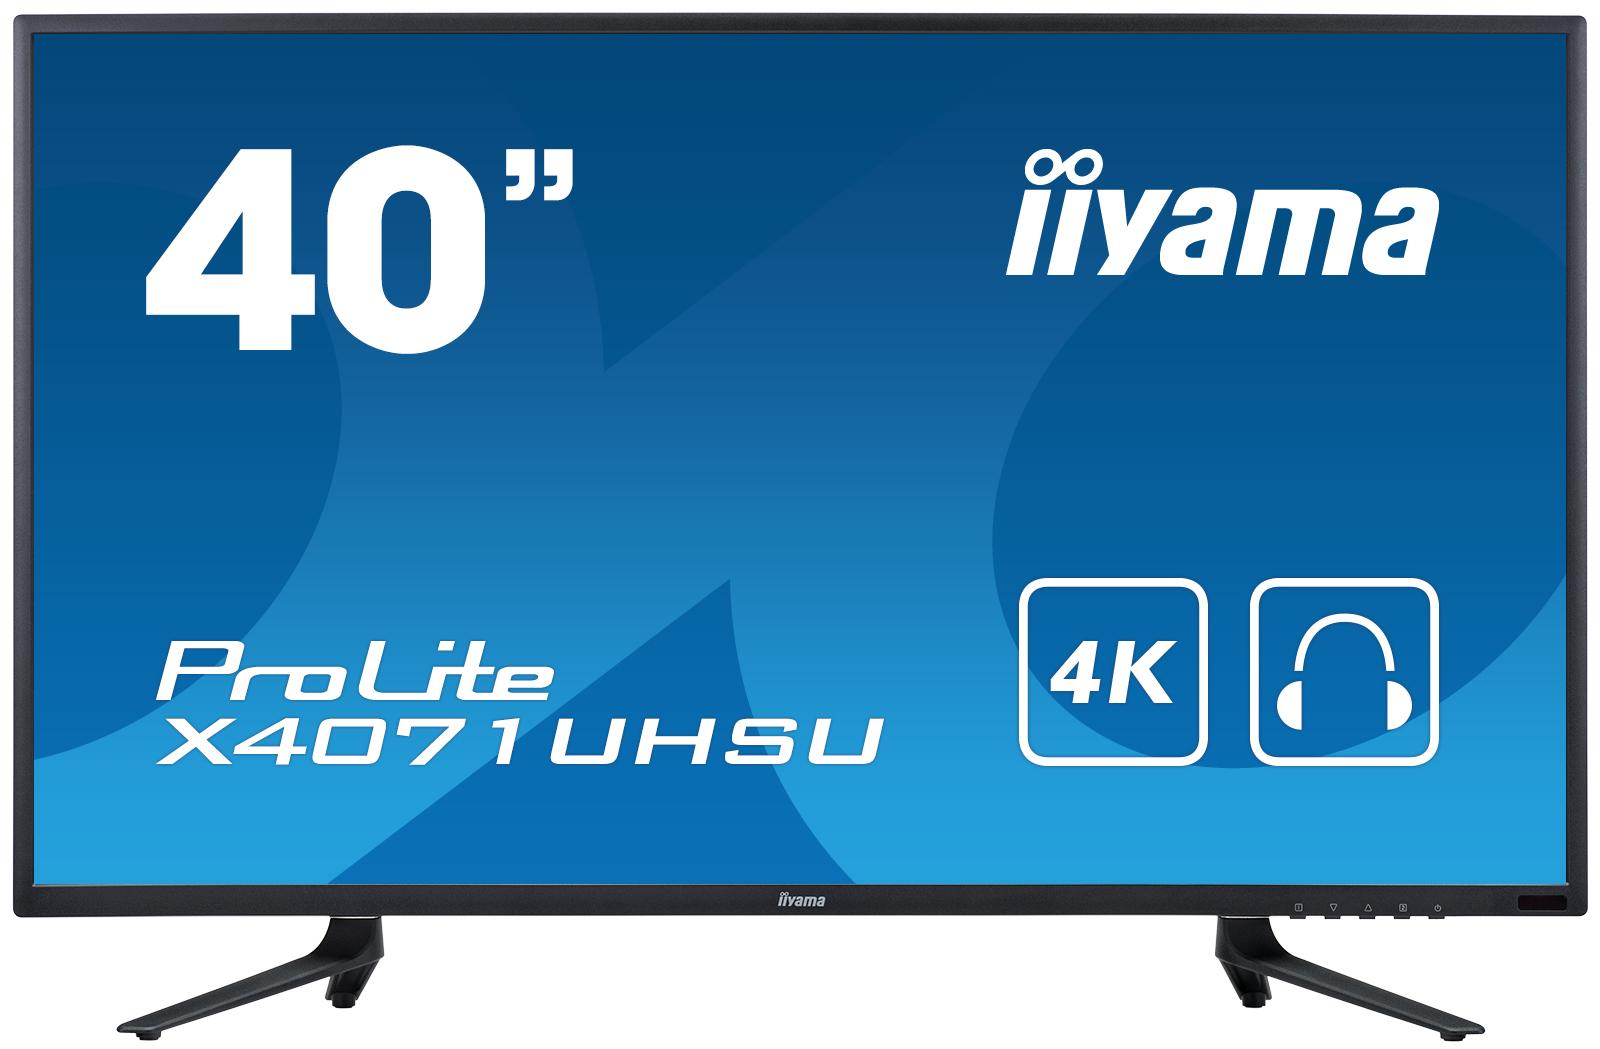 "40"" LCD iiyama ProLite X4071UHSU-B1 -4K, MVA, 350cd/m2, 3ms, 3x HDMI, DP, 3x USB 3.0, RS232C, repro"